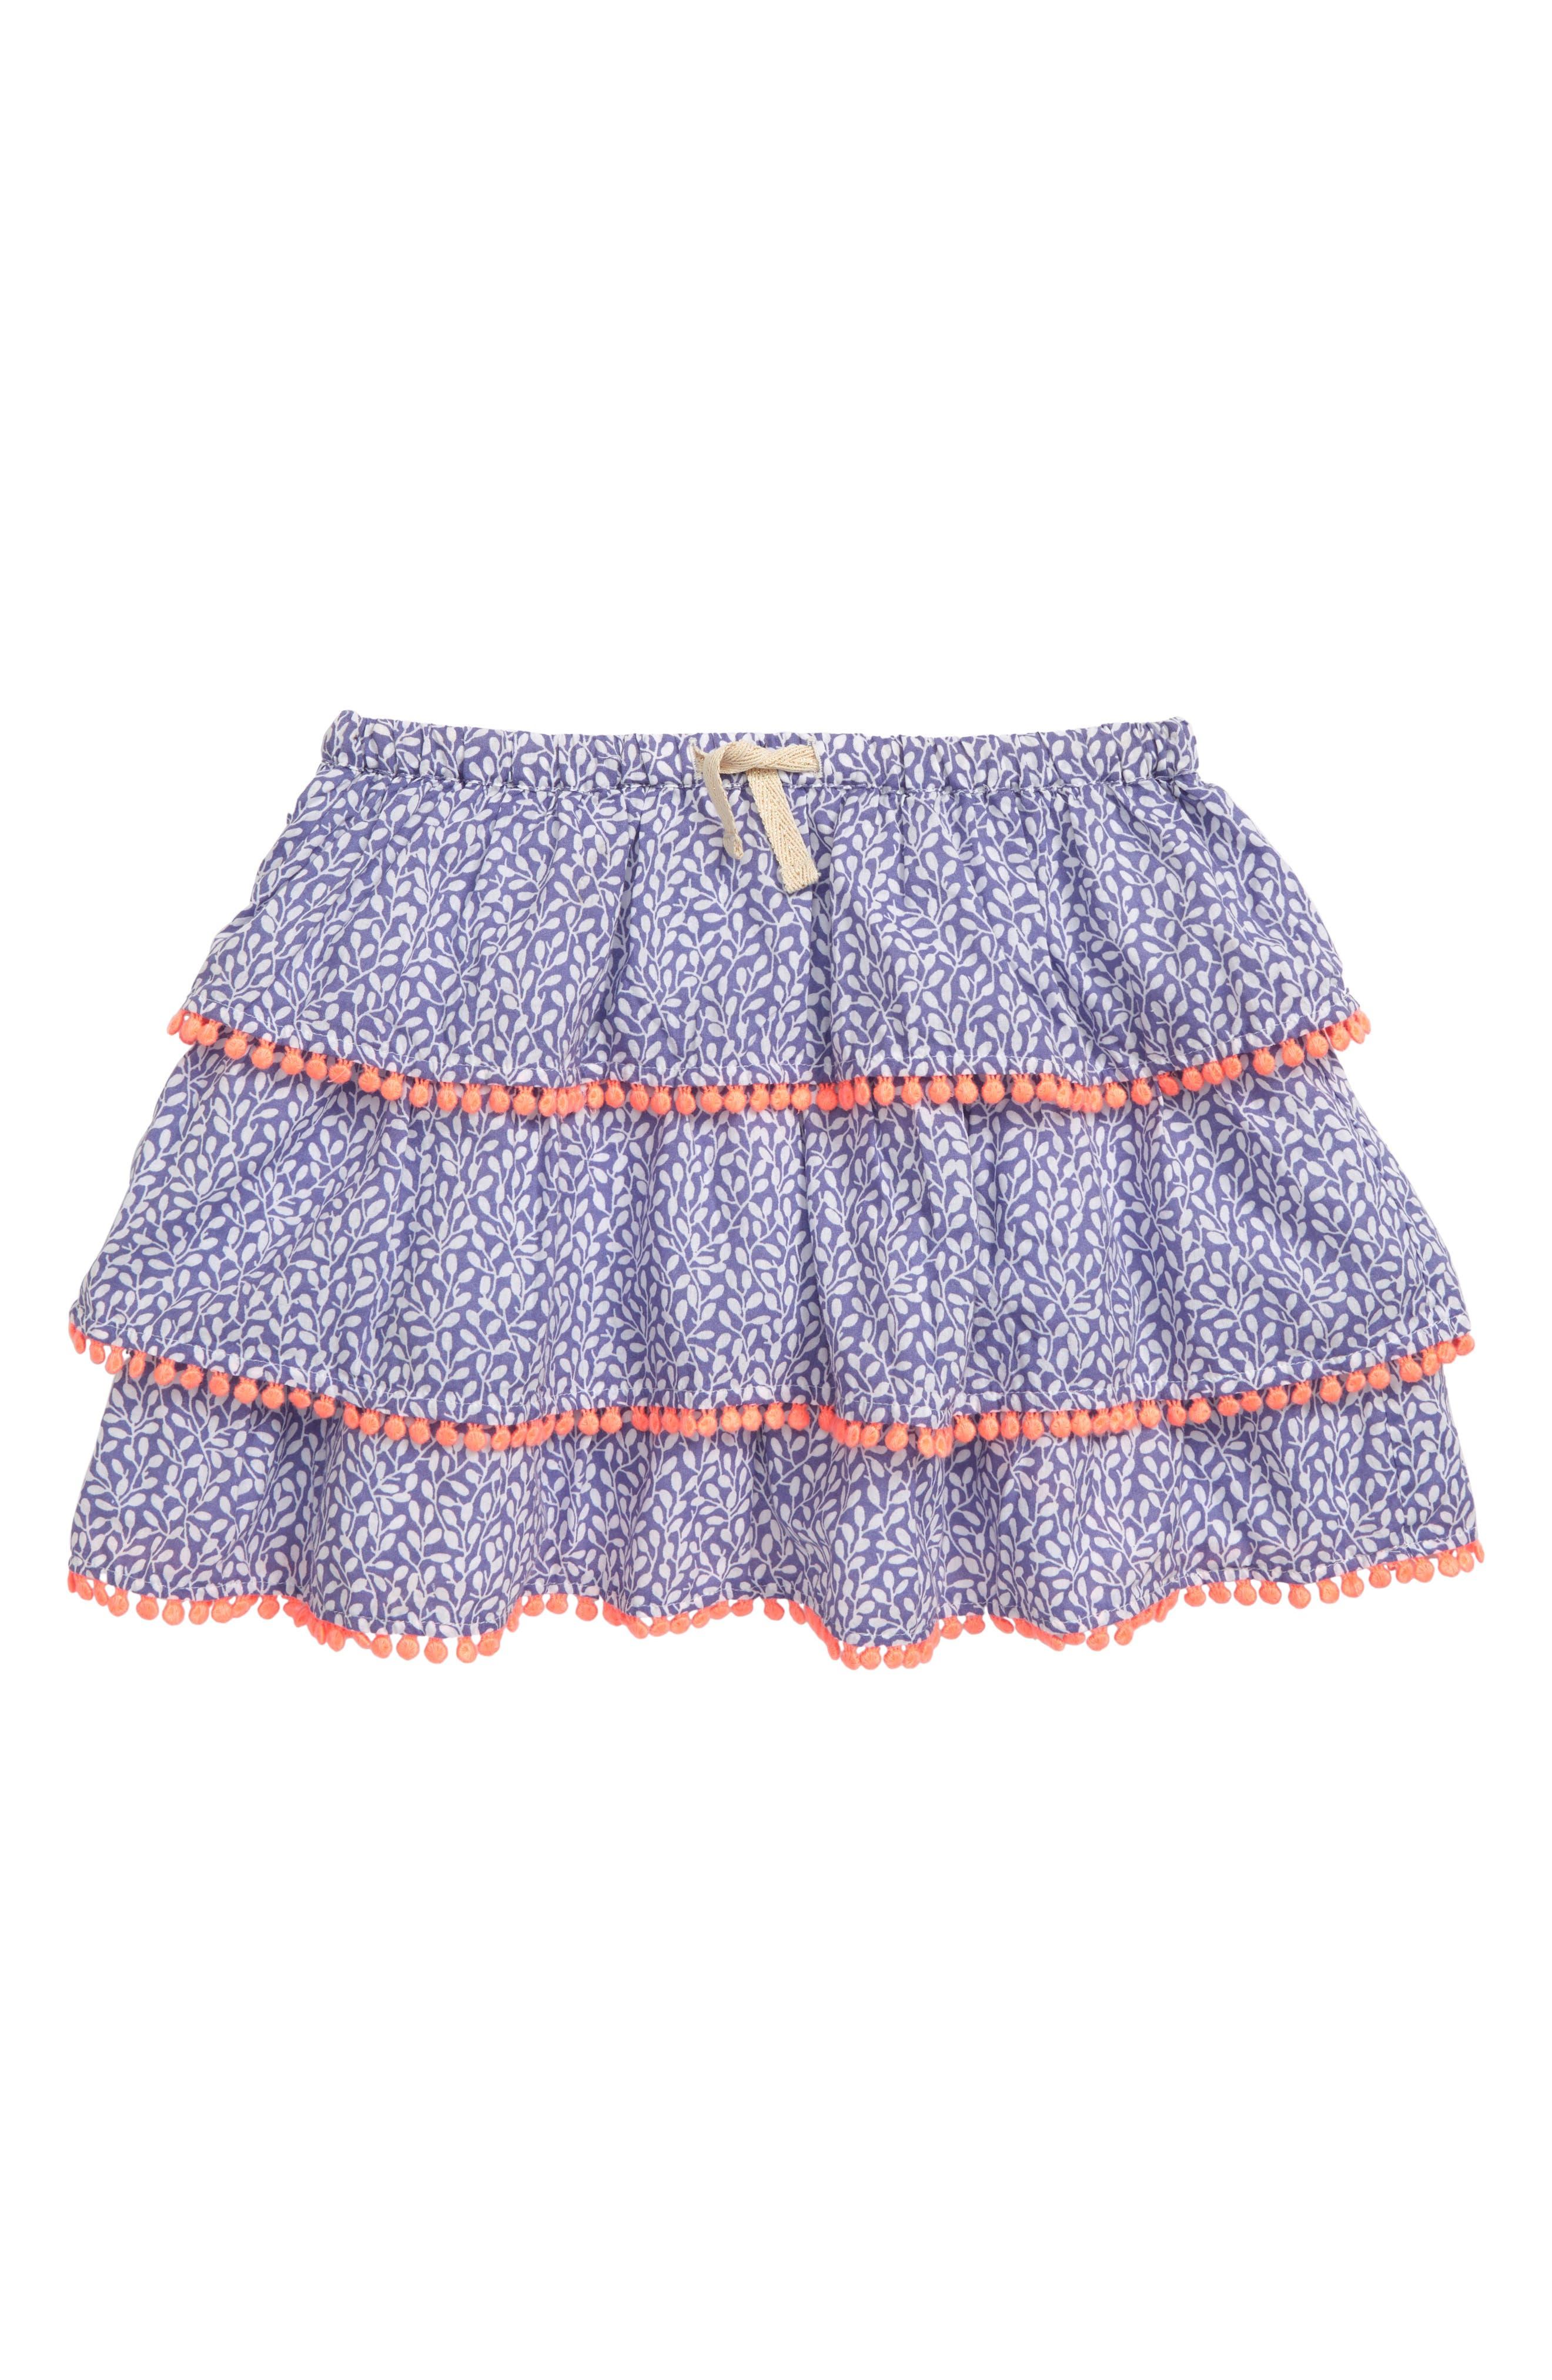 Toddler Girls Mini Boden Print Ruffle Skirt Size 34Y  Purple